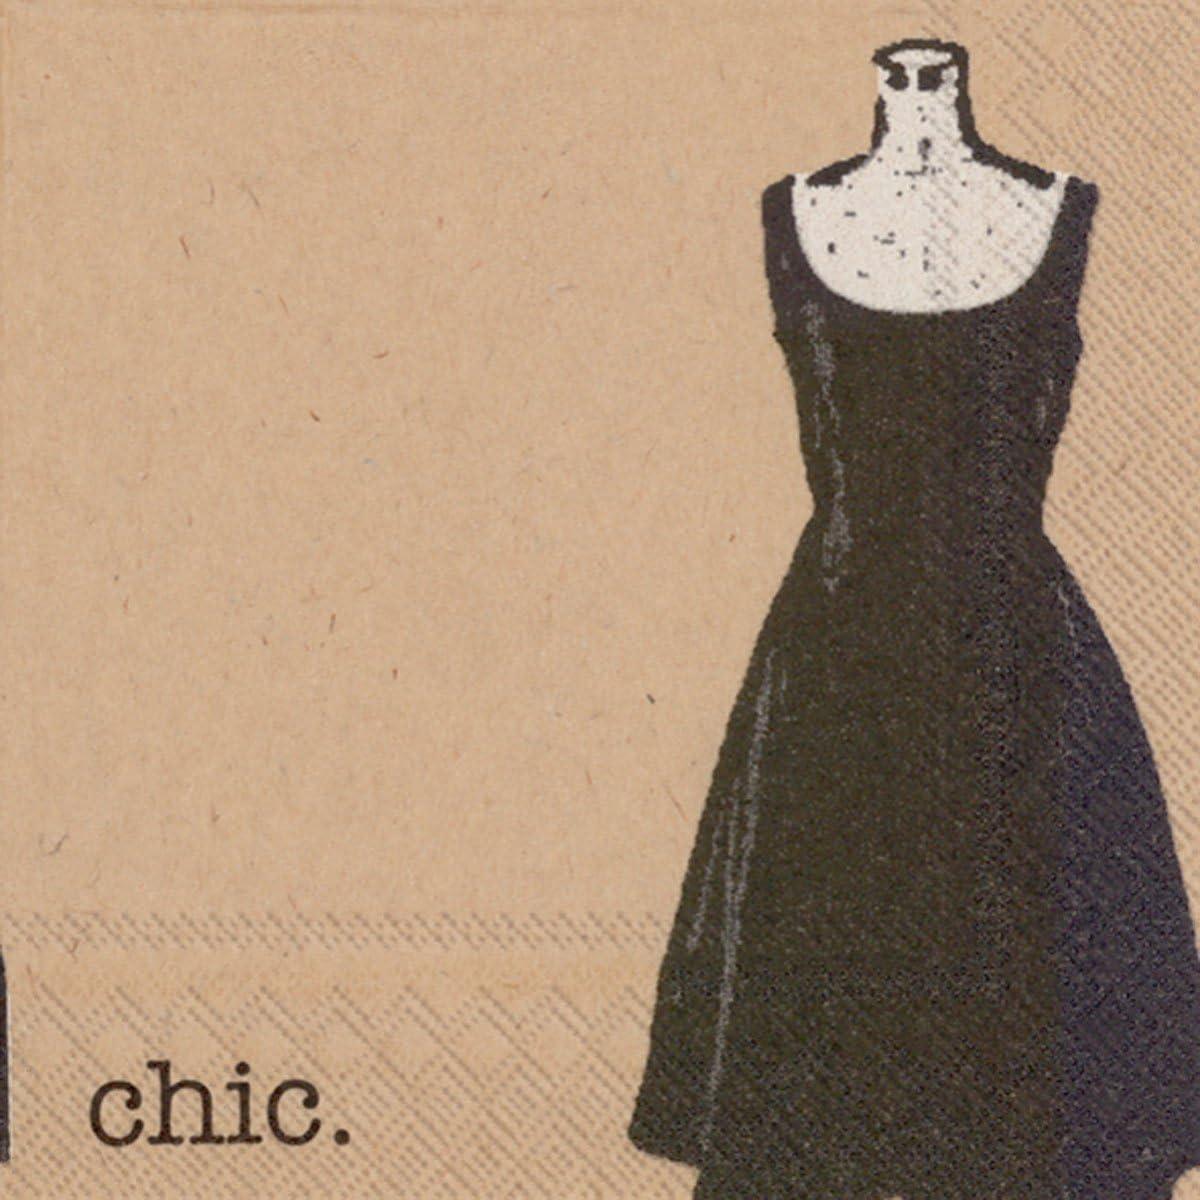 Boston International Ideal Home Range 20-Count Brown Paper Cocktail Napkins, Little Black Dress